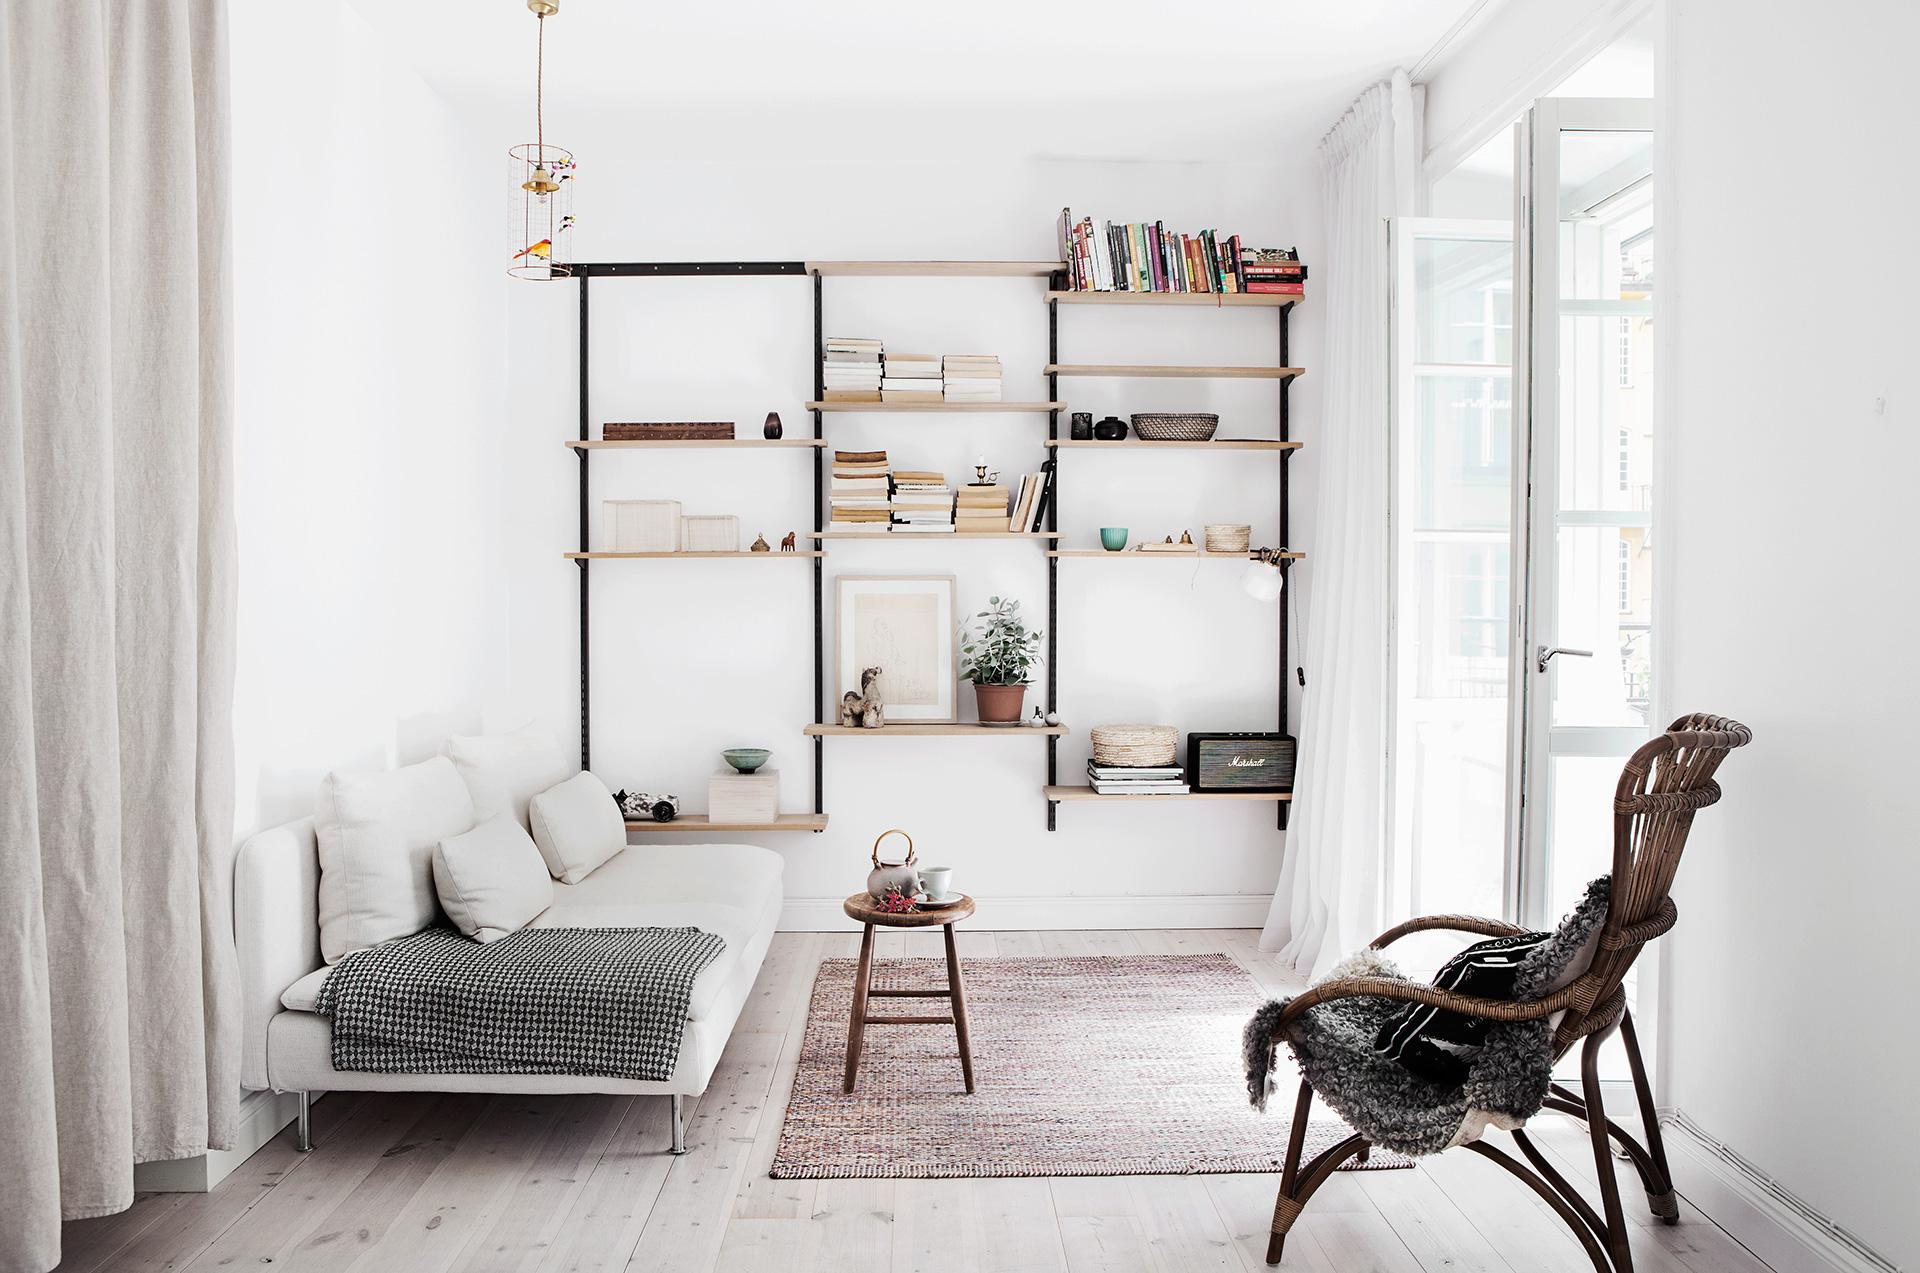 Moderne woonkamer meubels inspiratie tgwonen for Woonkamer design